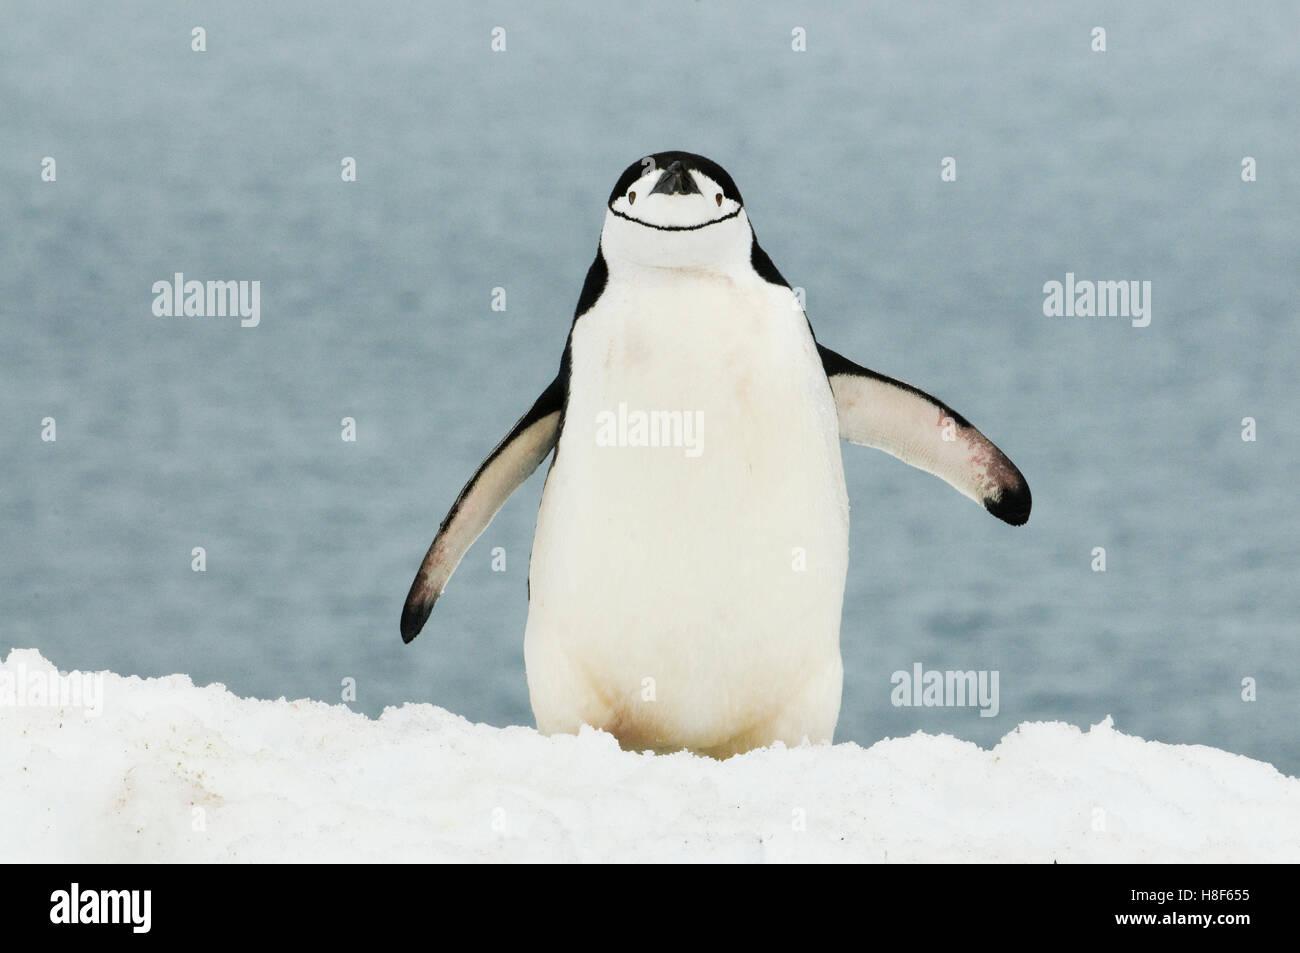 Pinguini Chinstrap (Pygoscelis Antartide) Penisola Antartica, Antartide Immagini Stock